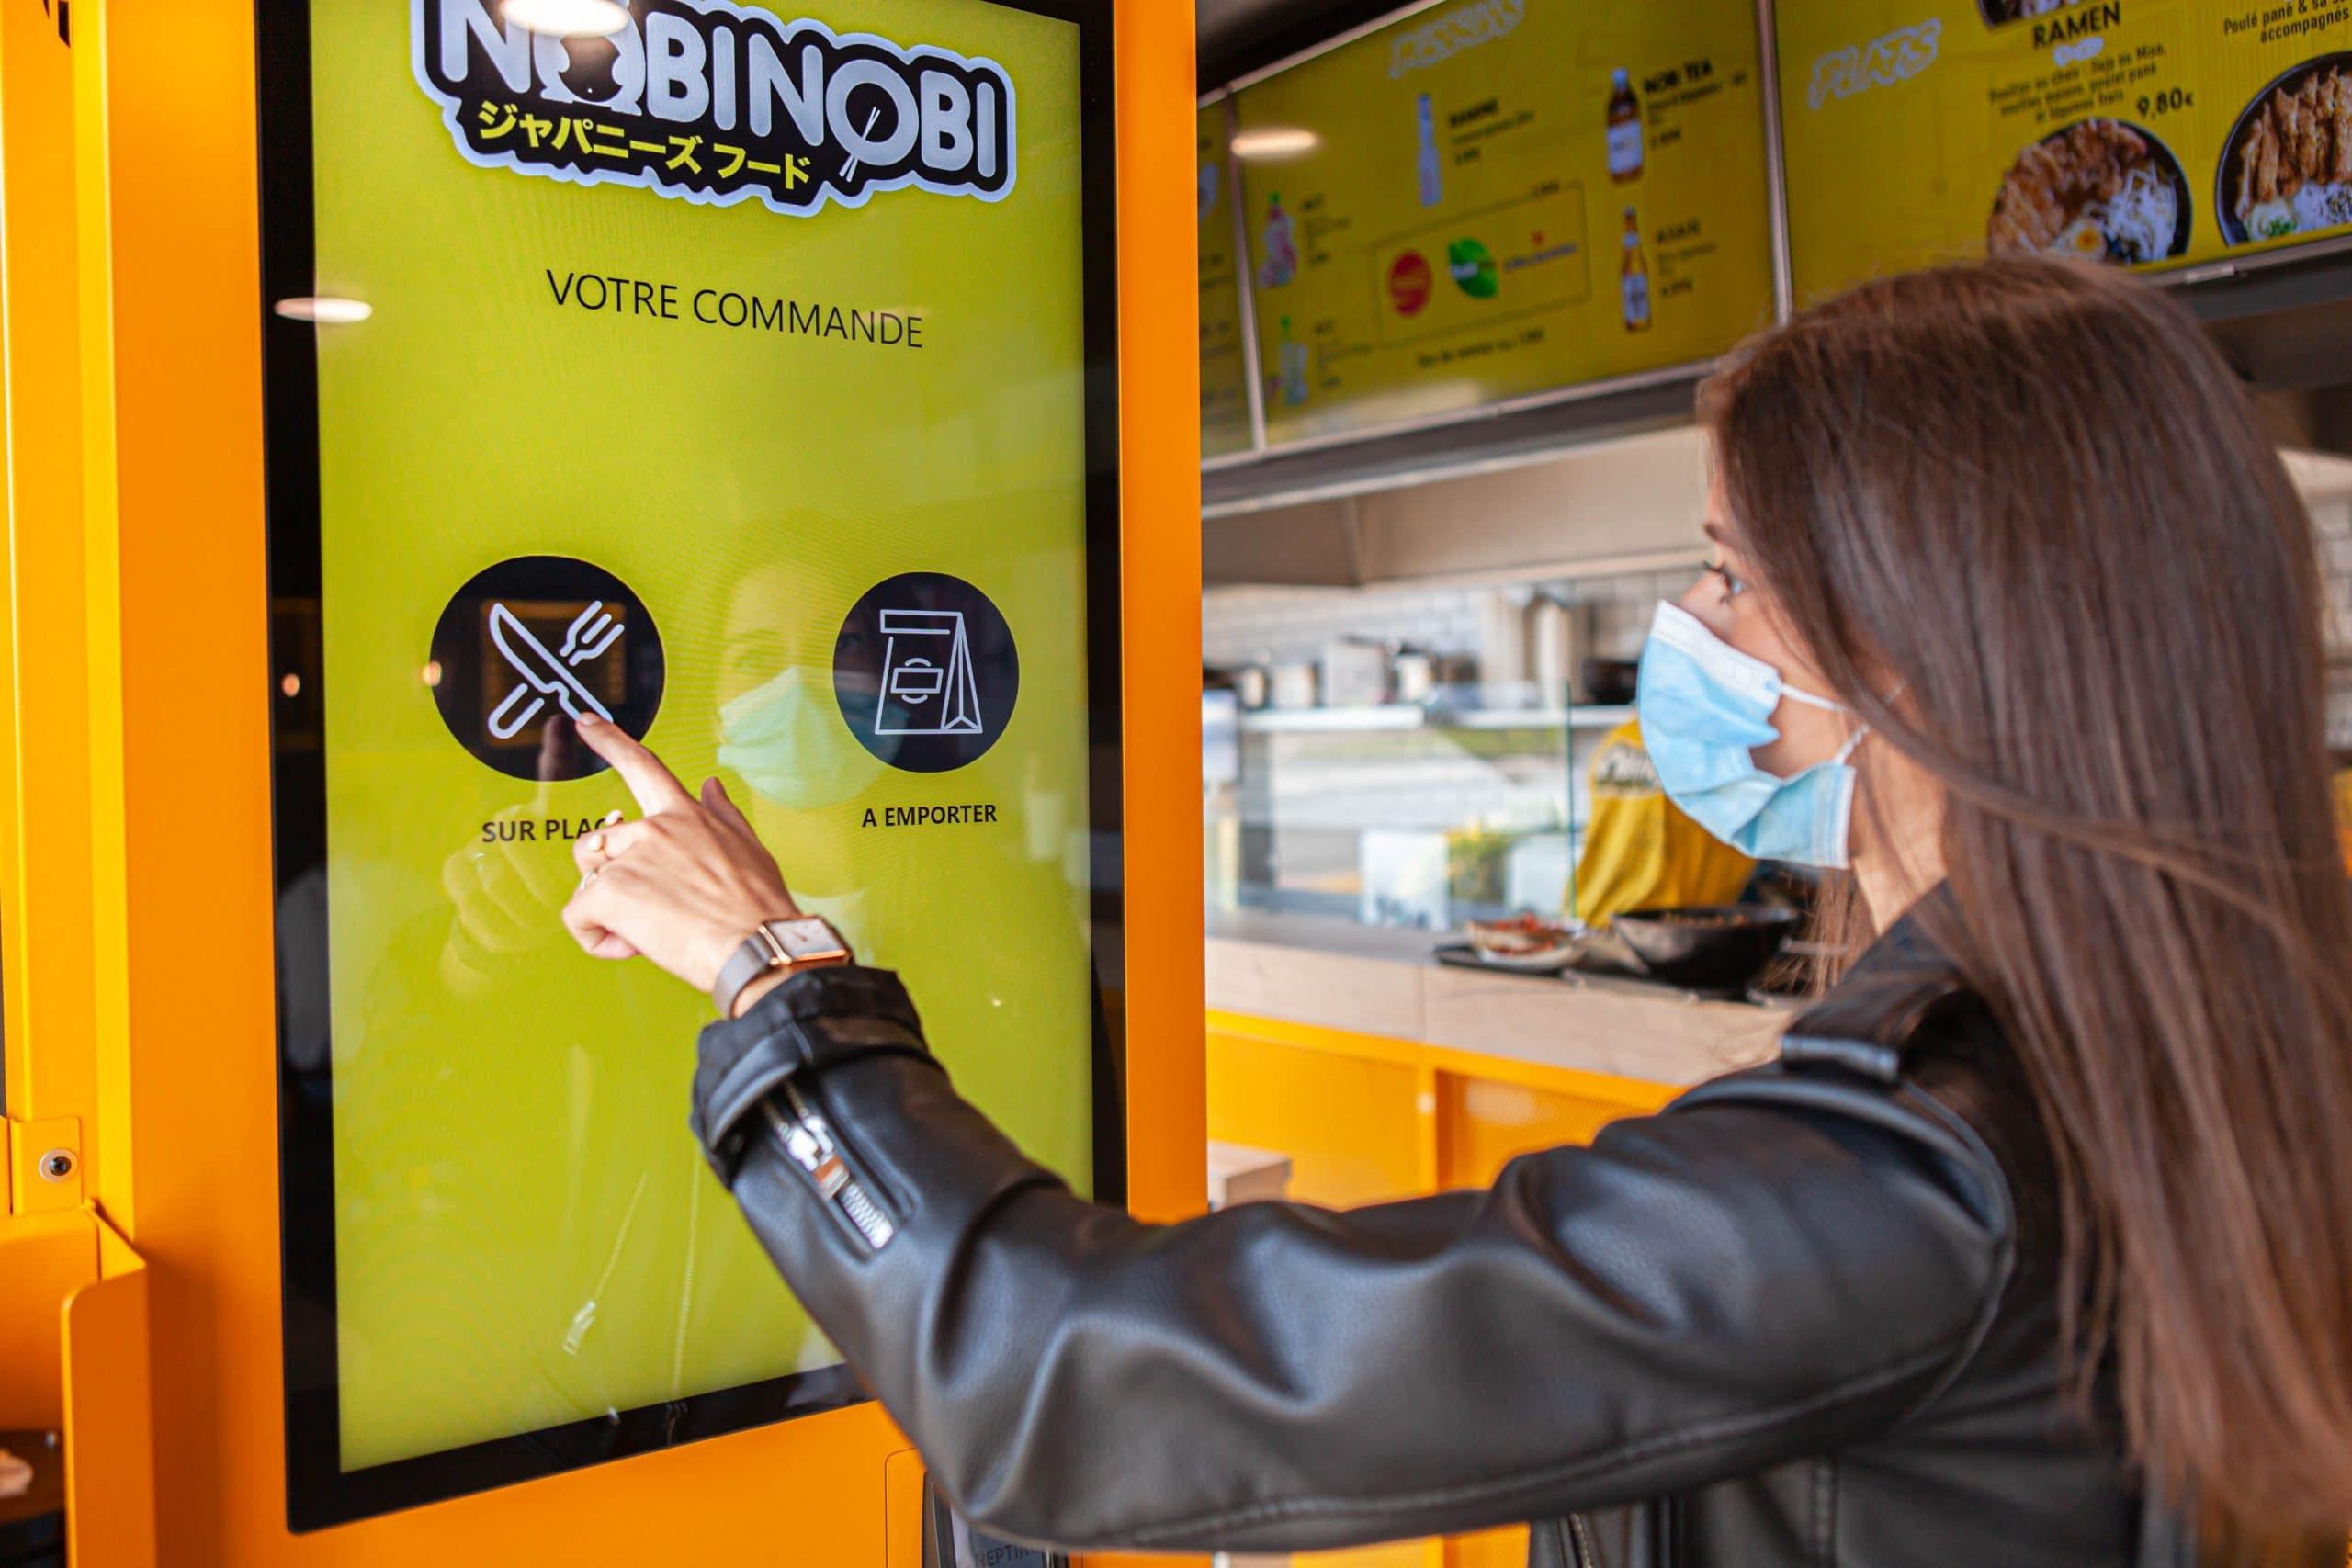 nobi-nobi-fargues-caroussel-3